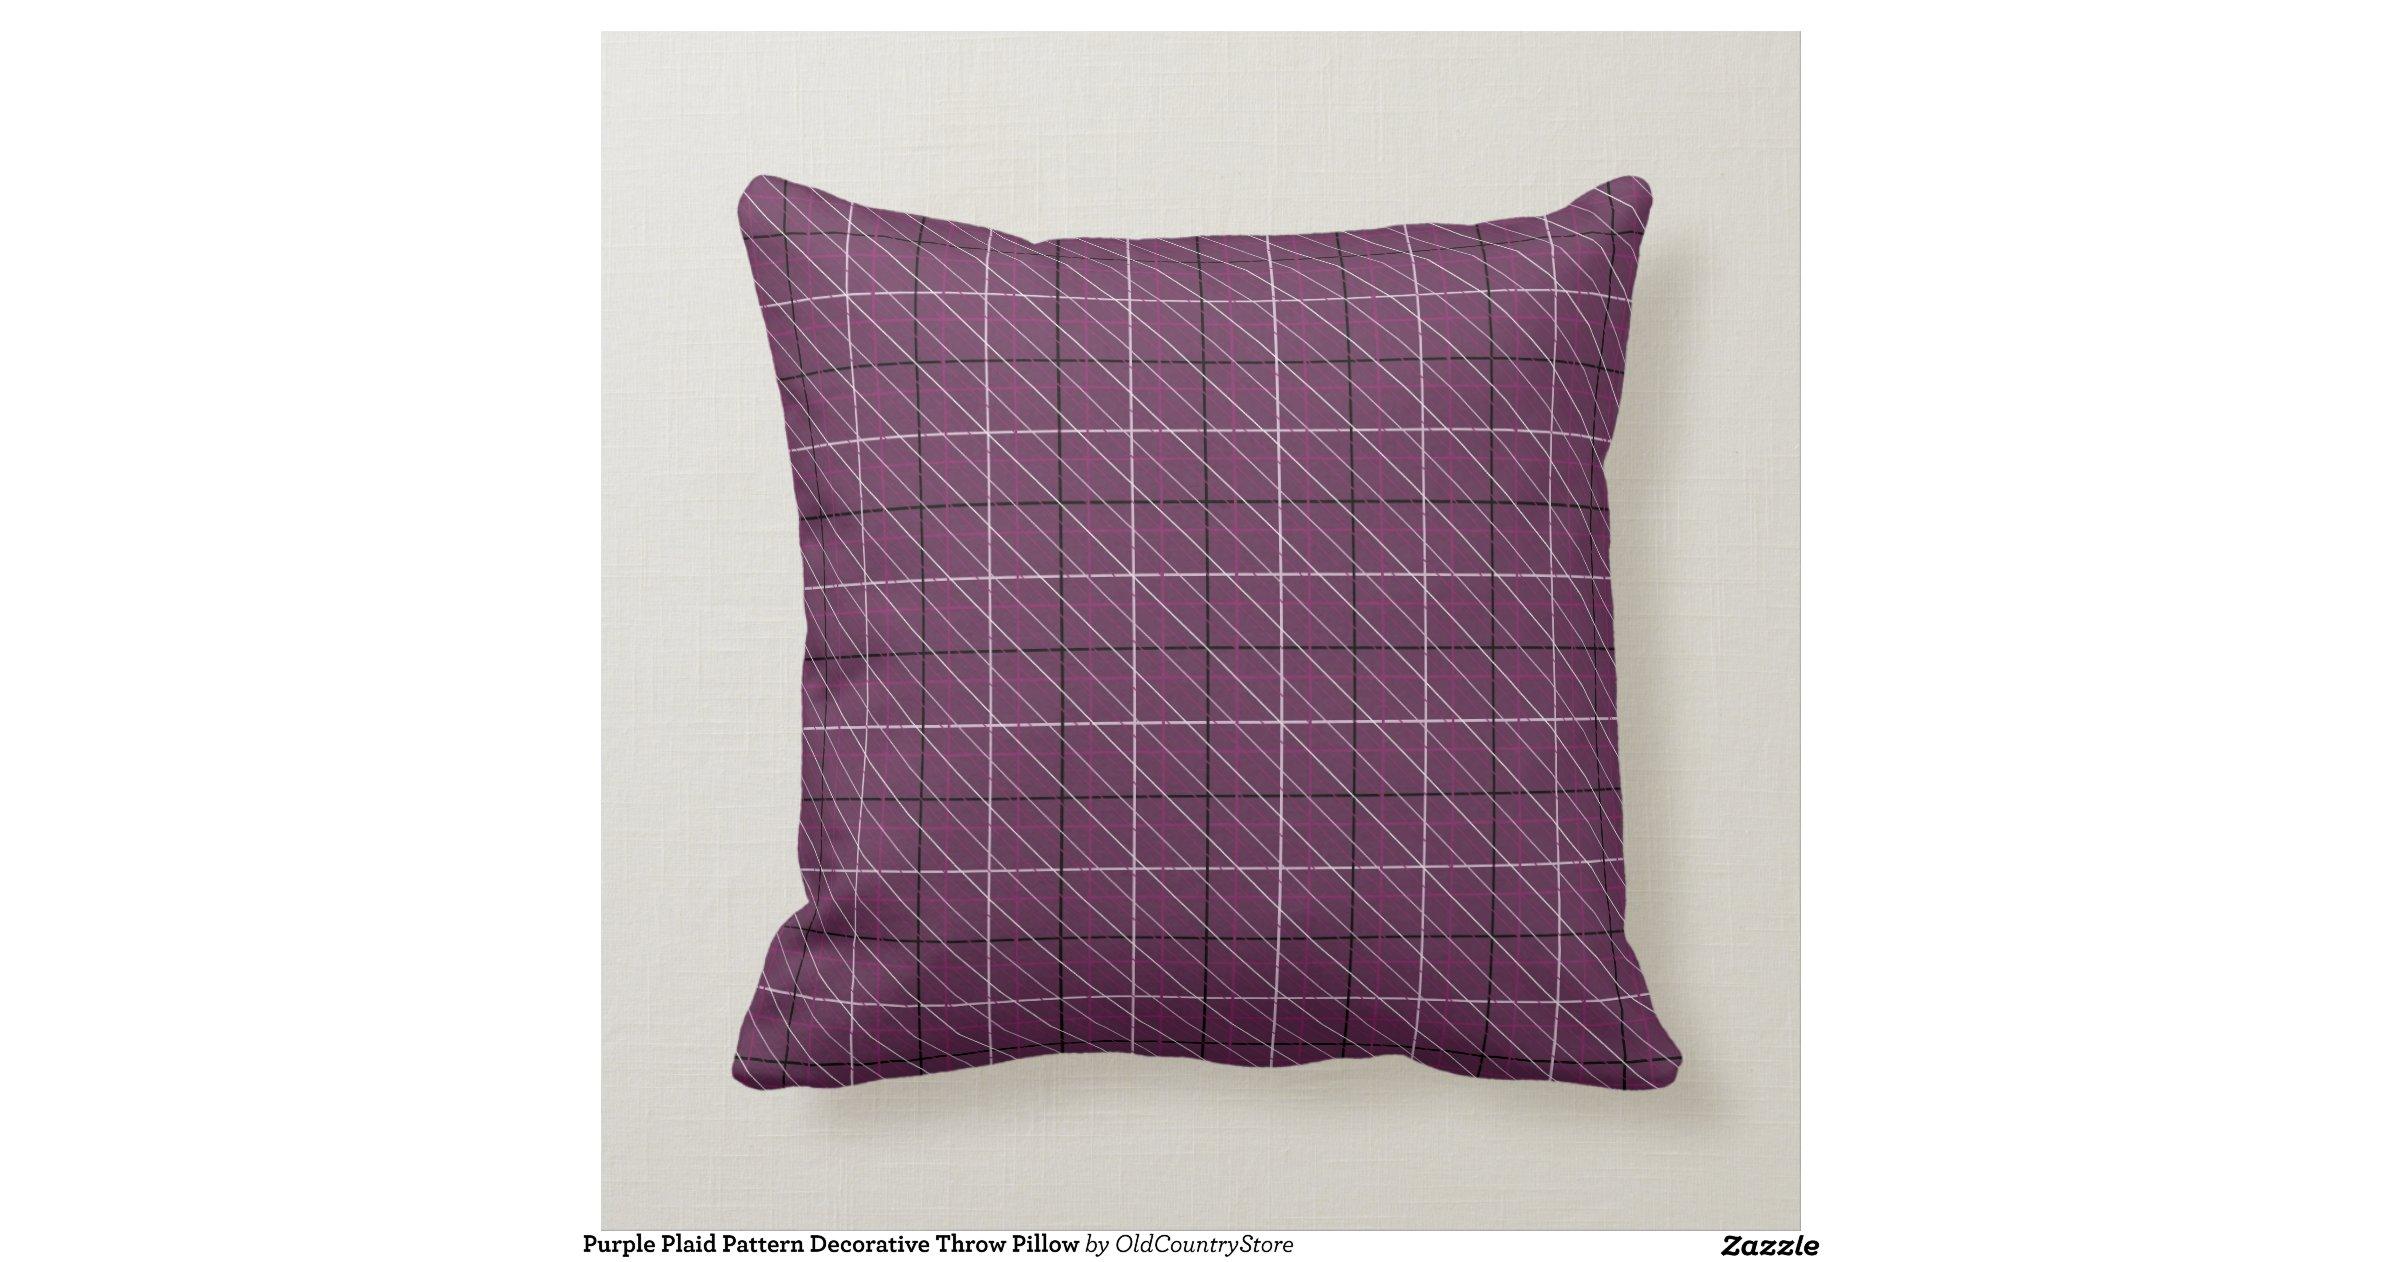 Purple Plaid Pattern Decorative Throw Pillow Throw Cushions Zazzle